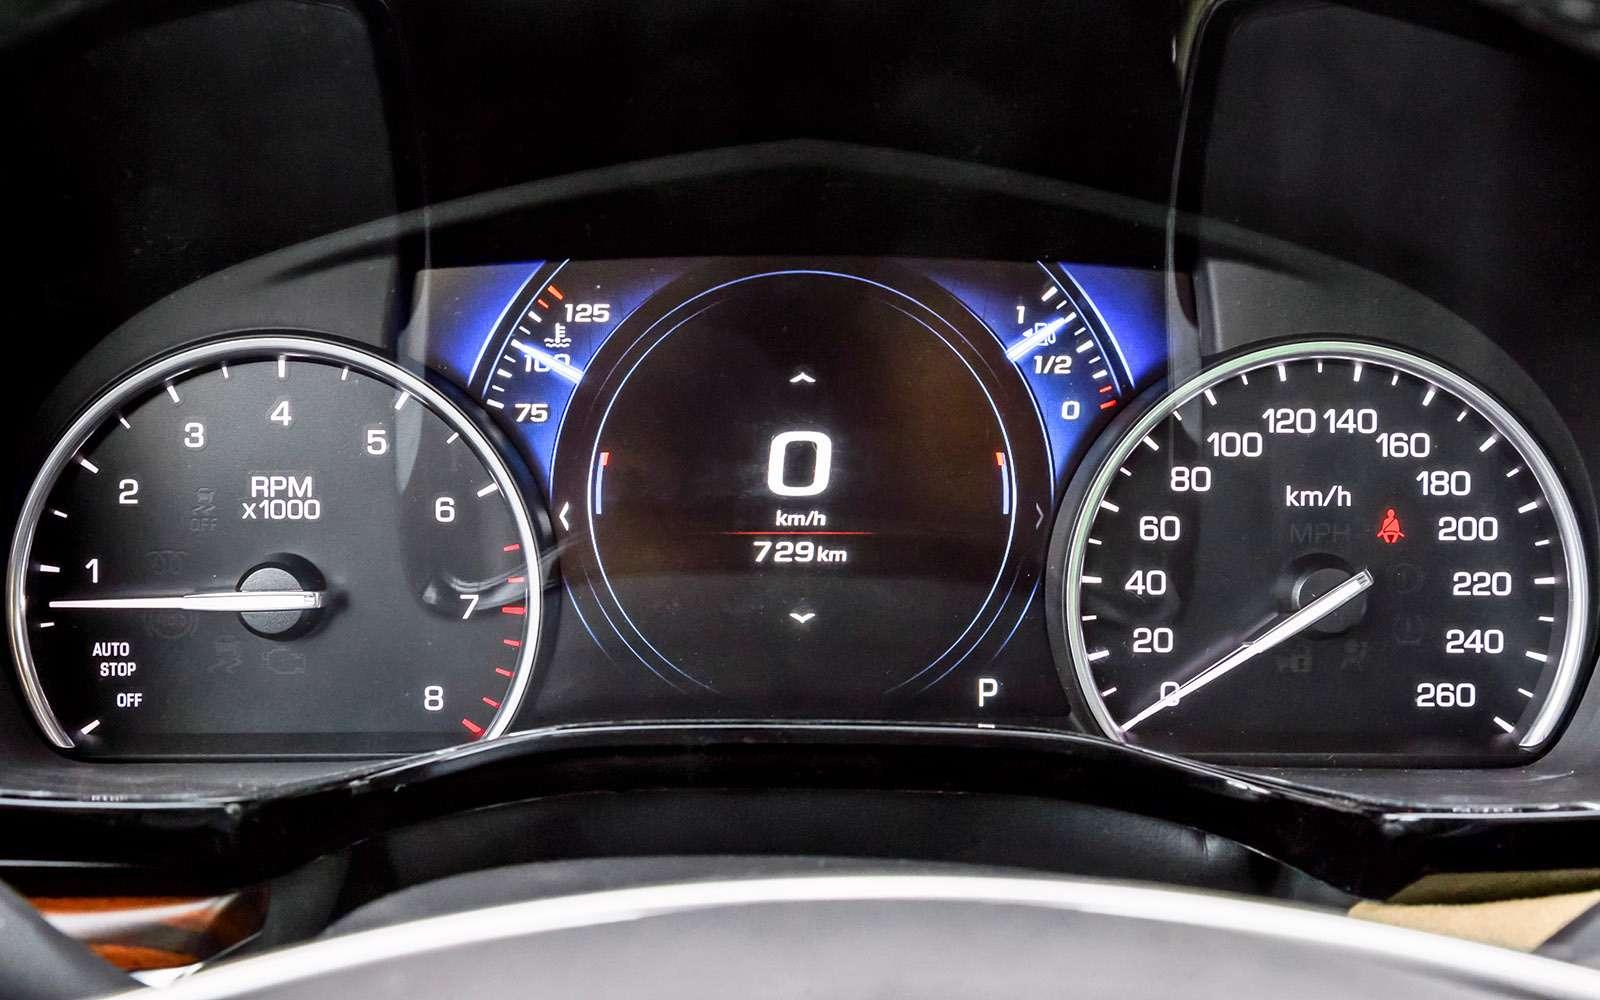 Тест премиум-кроссоверов: Lexus RX350, Cadillac XT5и Jaguar F-Pace— фото 721816